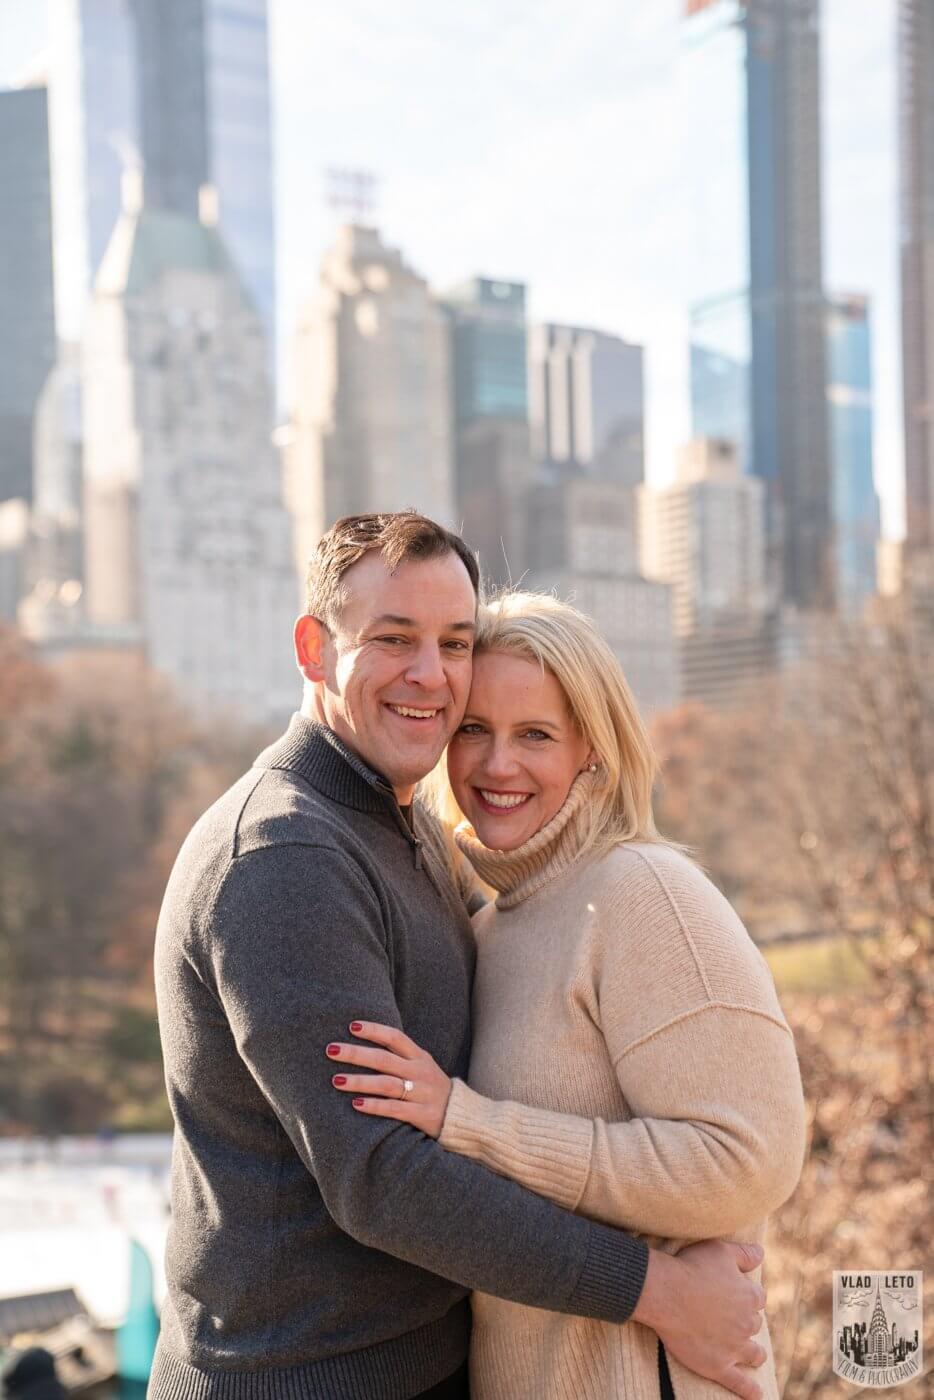 Photo 7 Central Park Wedding proposal   VladLeto